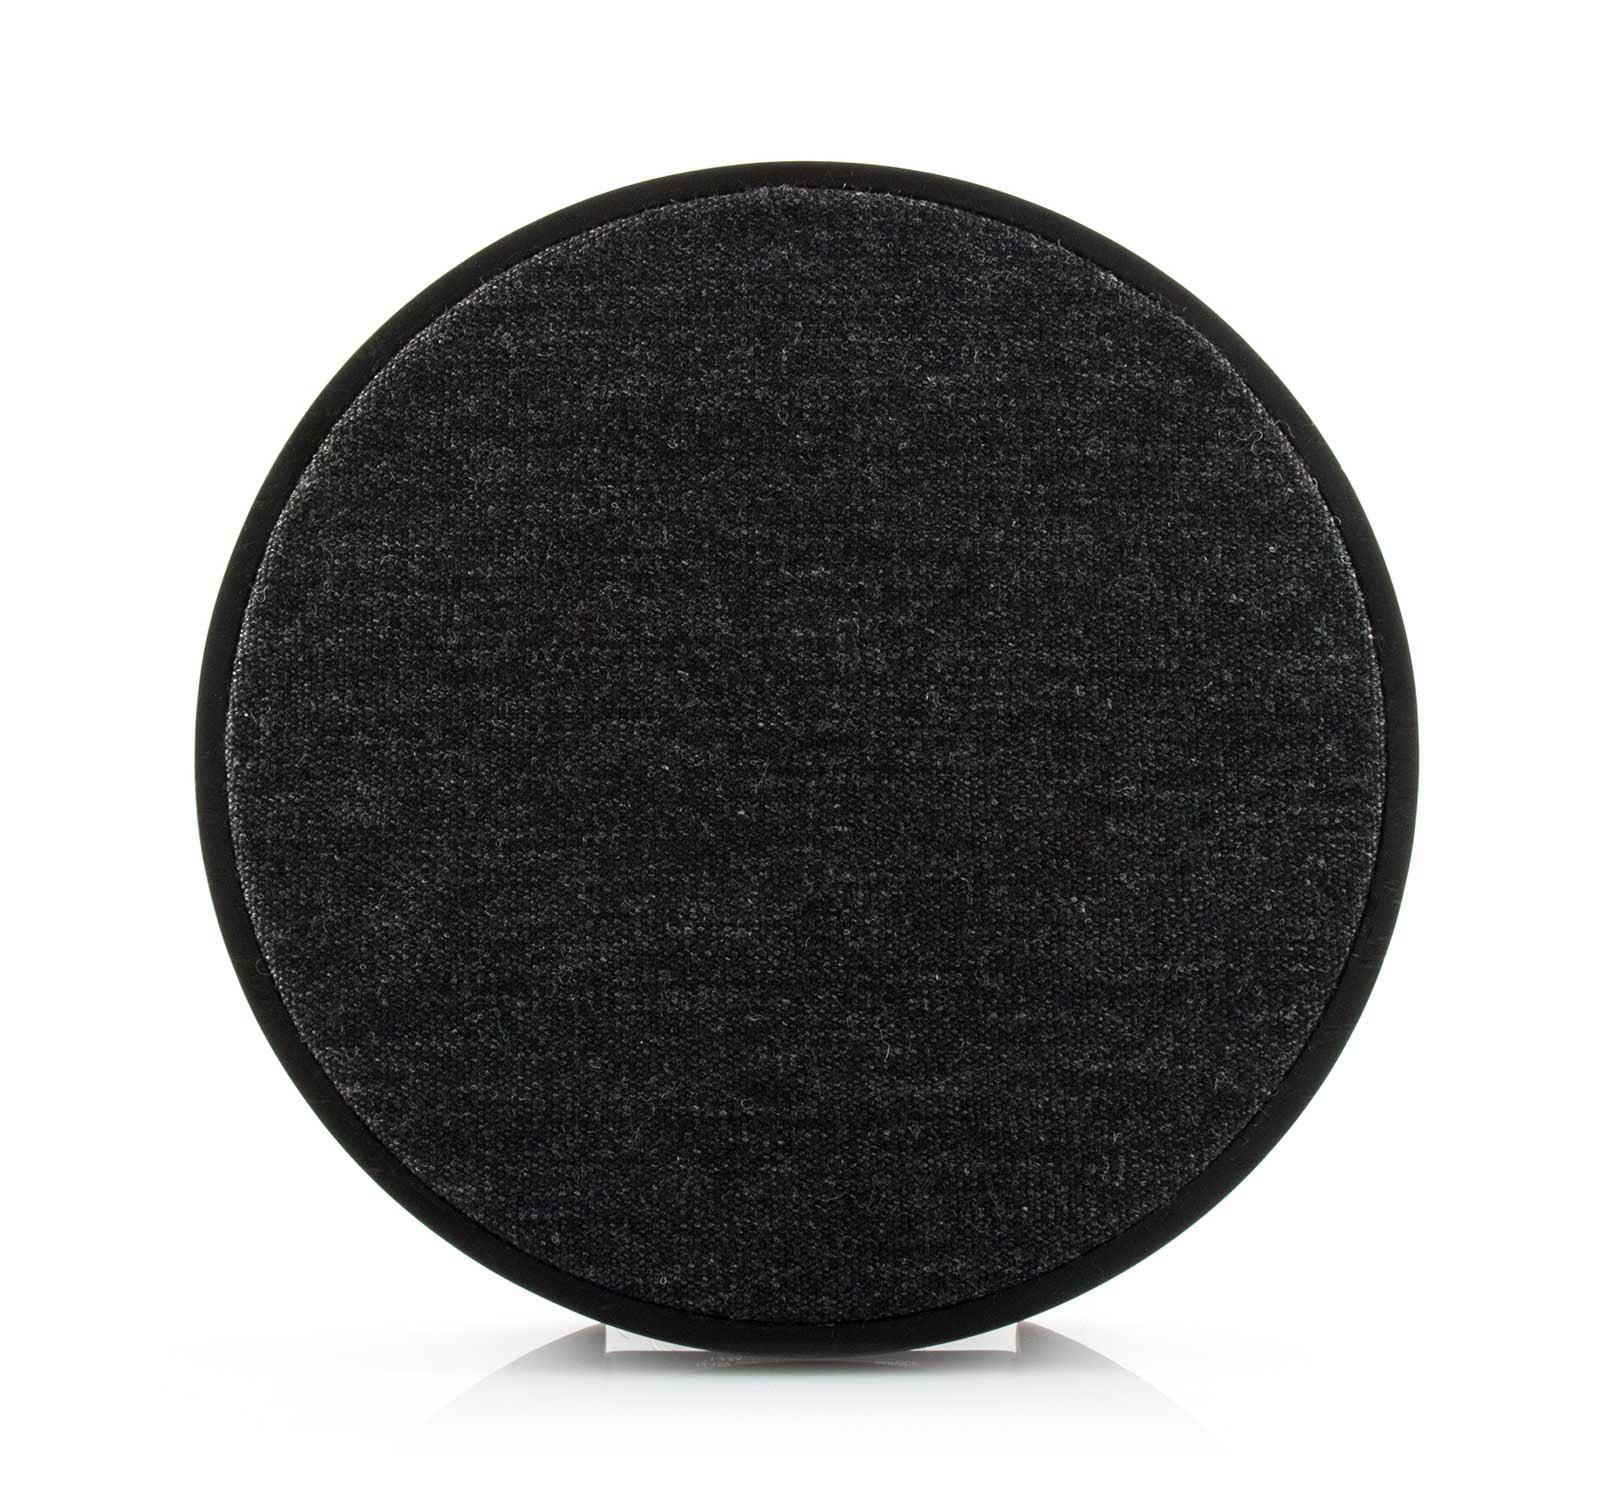 Tivoli ORB Black Black Wireless Speaker by Tivoli